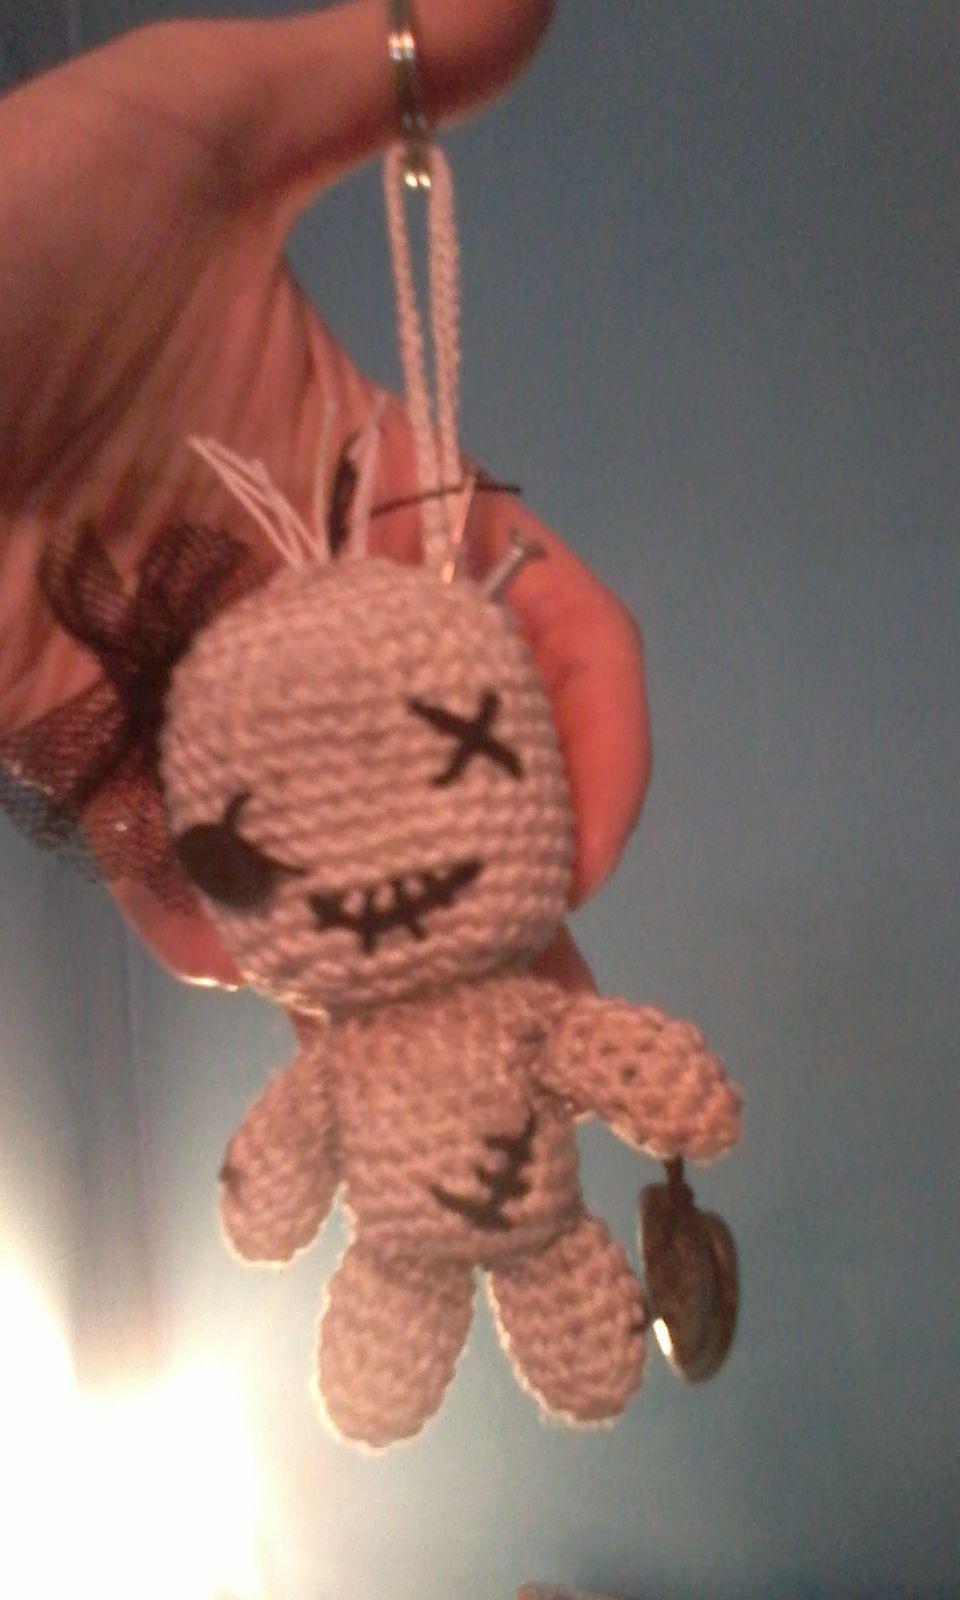 amigurumi voodoo doll keychain pattern: http://abbygurumi.tumblr.com ...